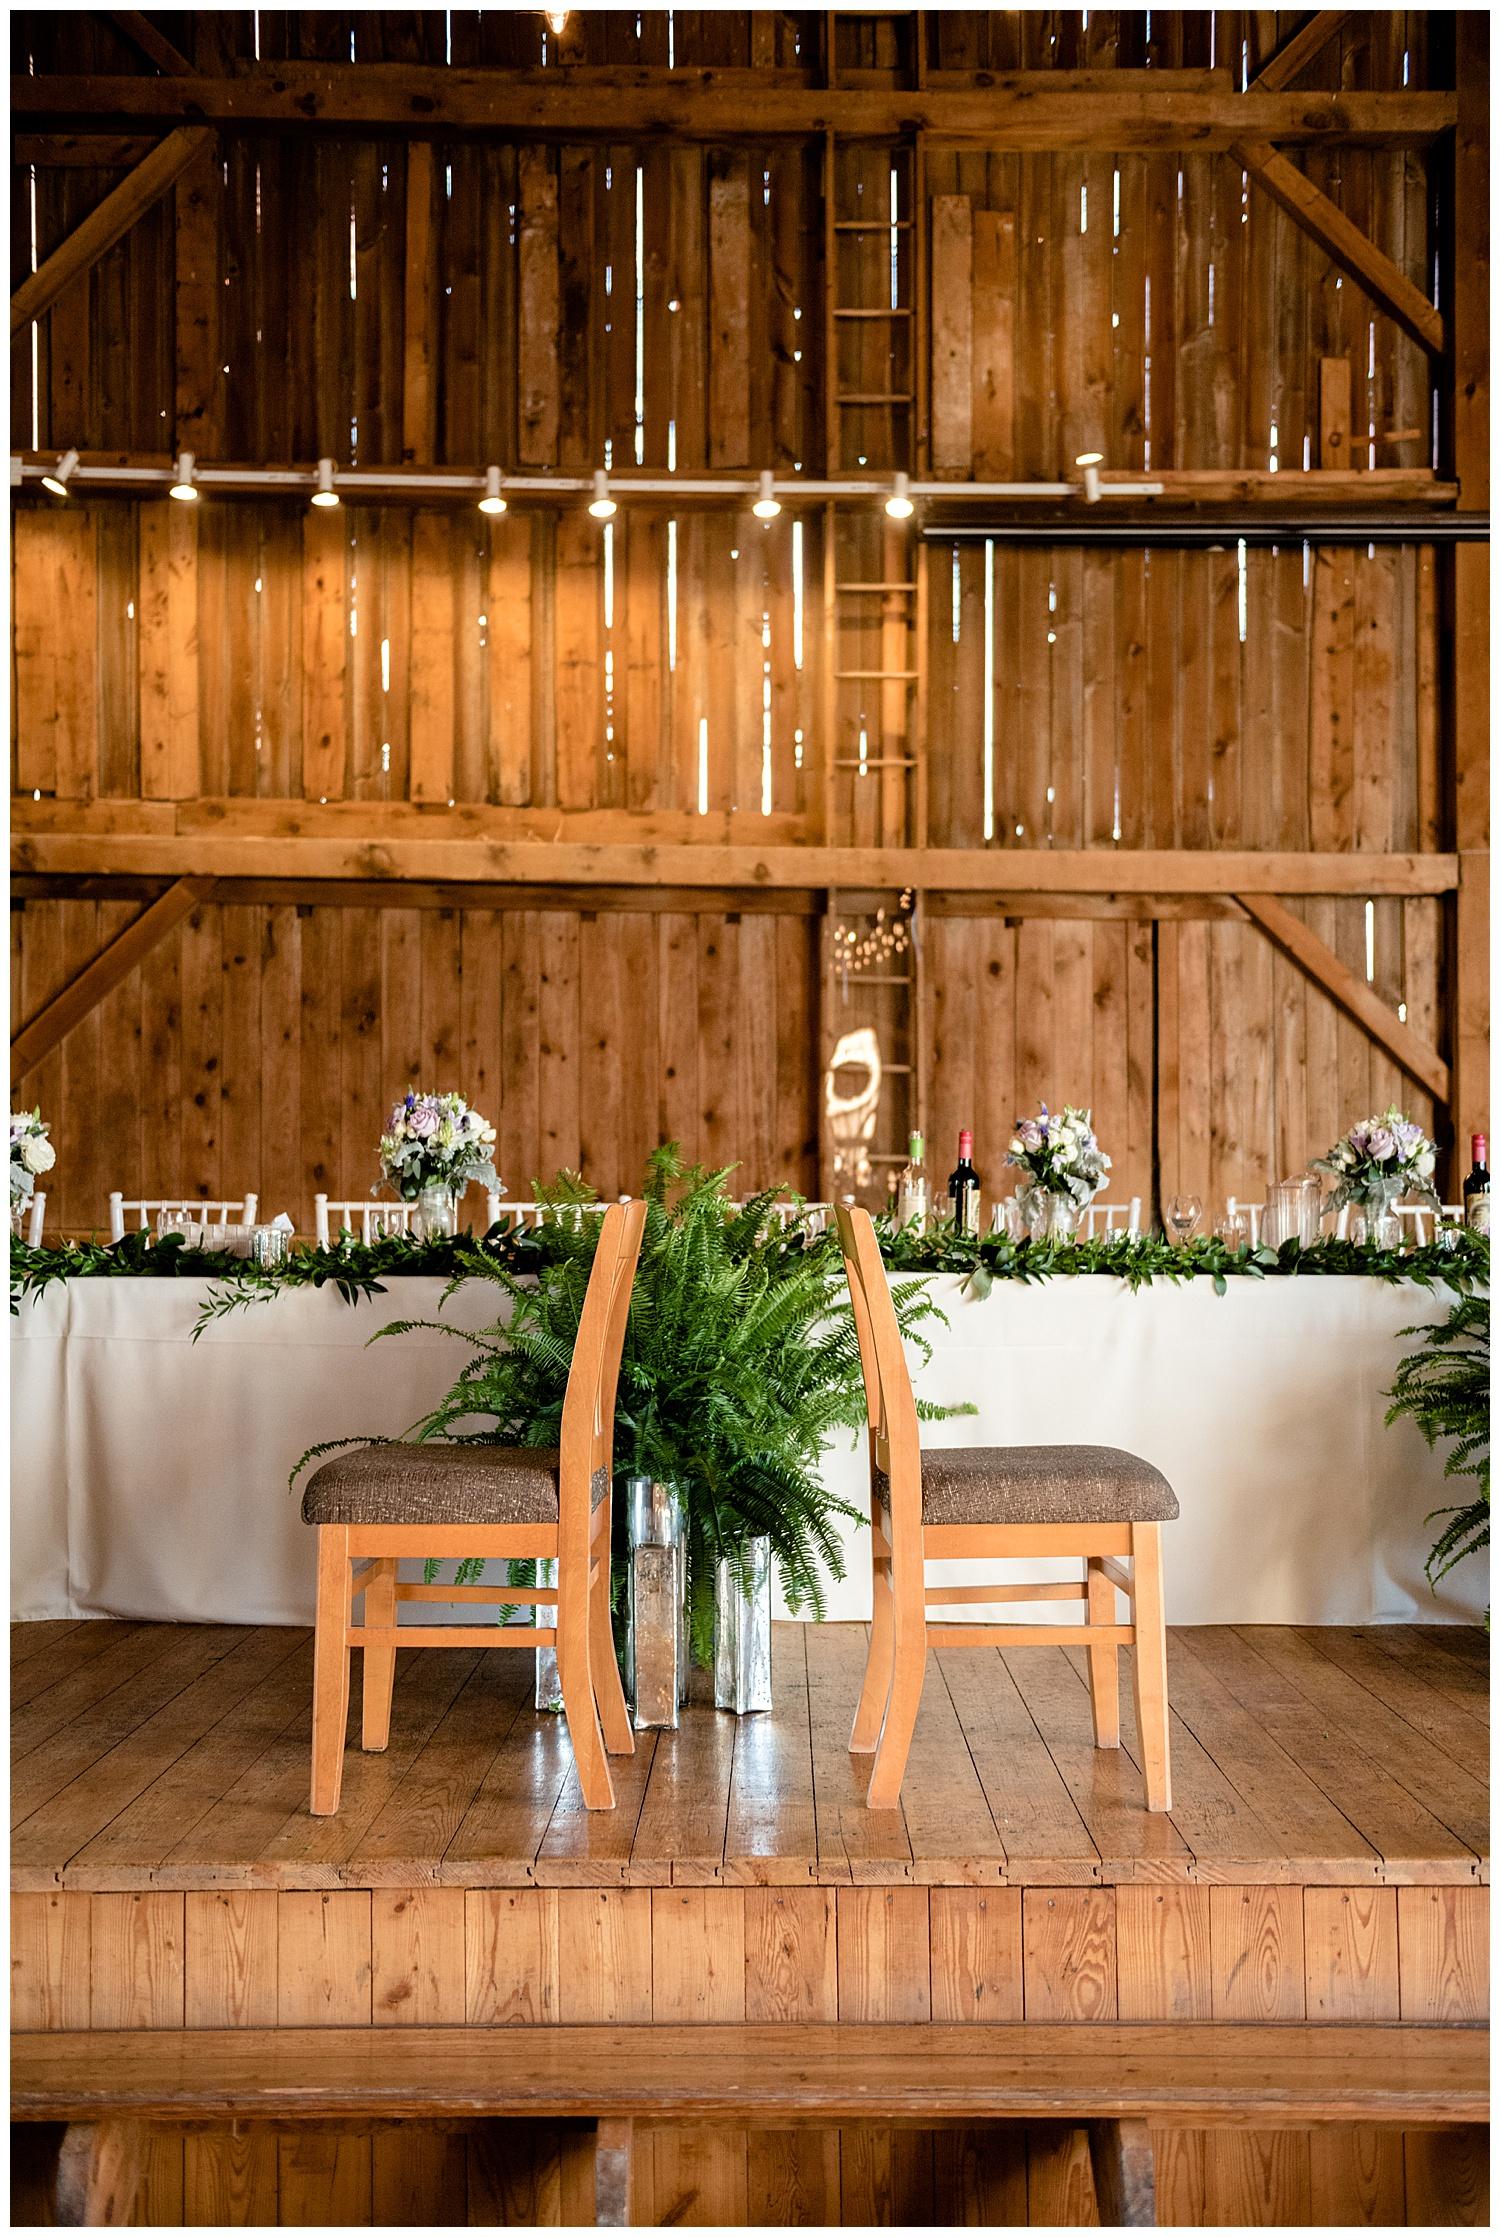 Prince Edward County Wedding Photography   Fields On West Lake Wedding   Holly McMurter Photographs